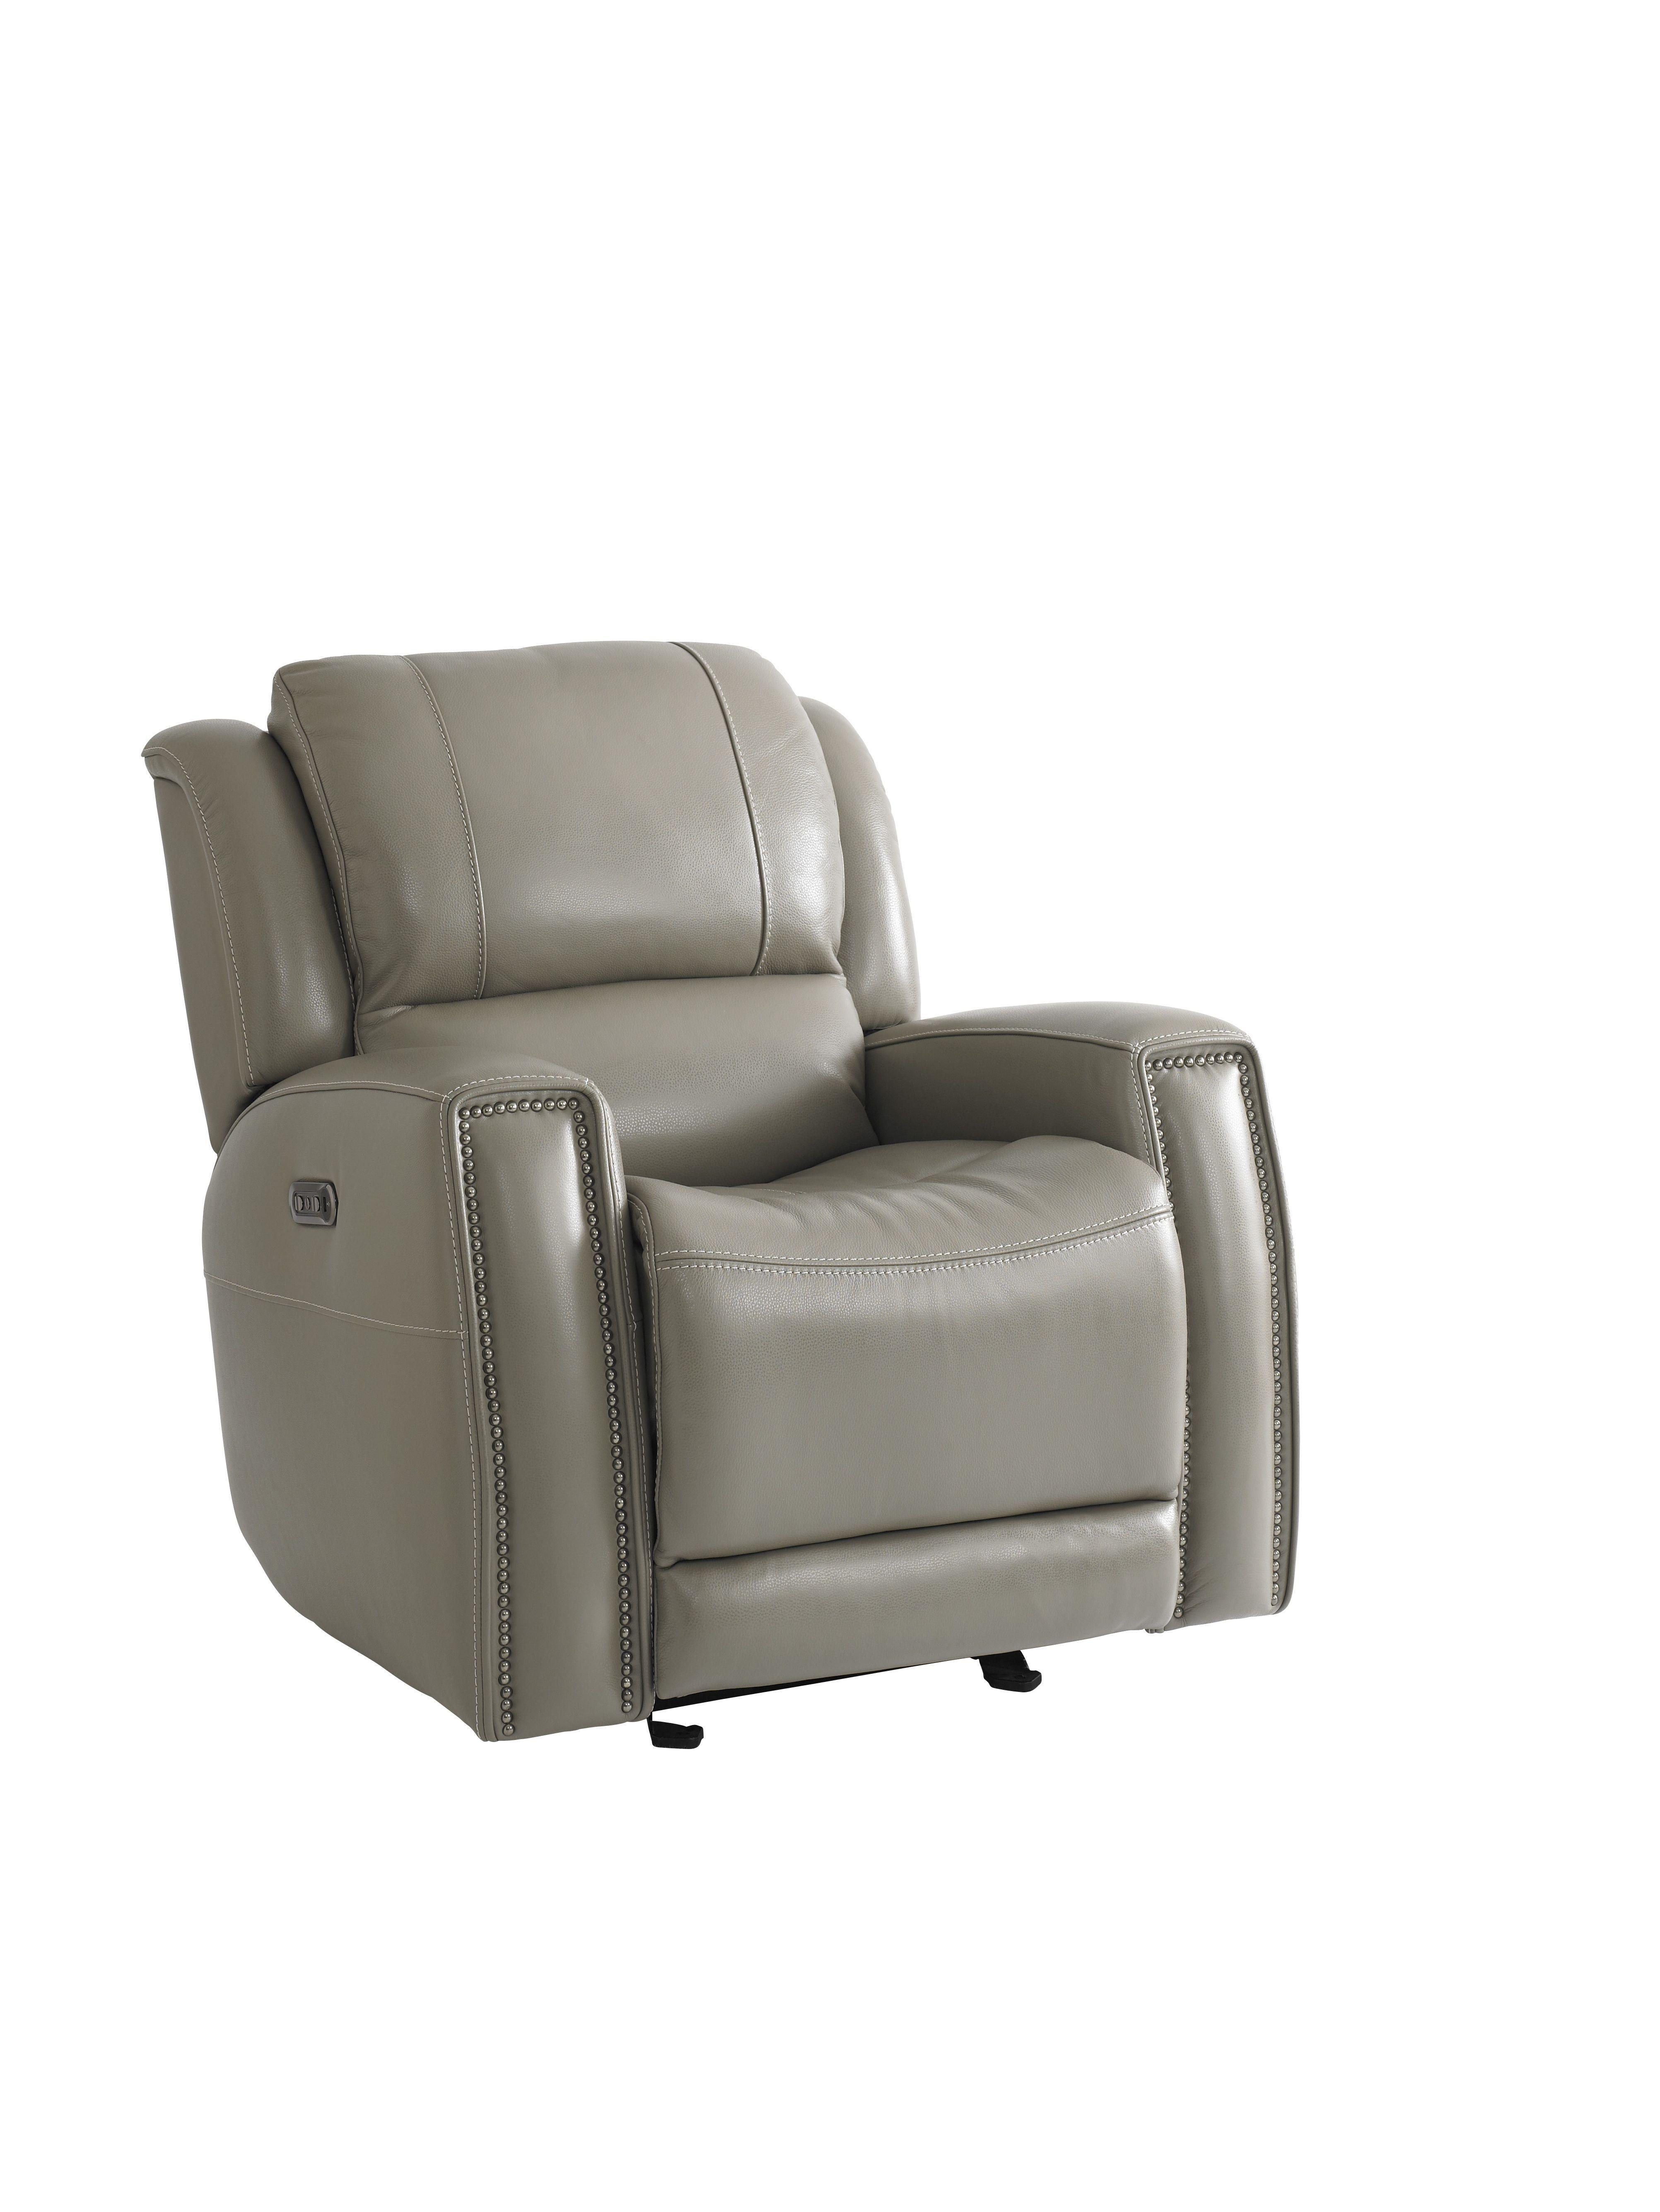 Avon Club Chairs & Sofas From Bassett Club Level Inside Landry Sofa Chairs (View 24 of 25)